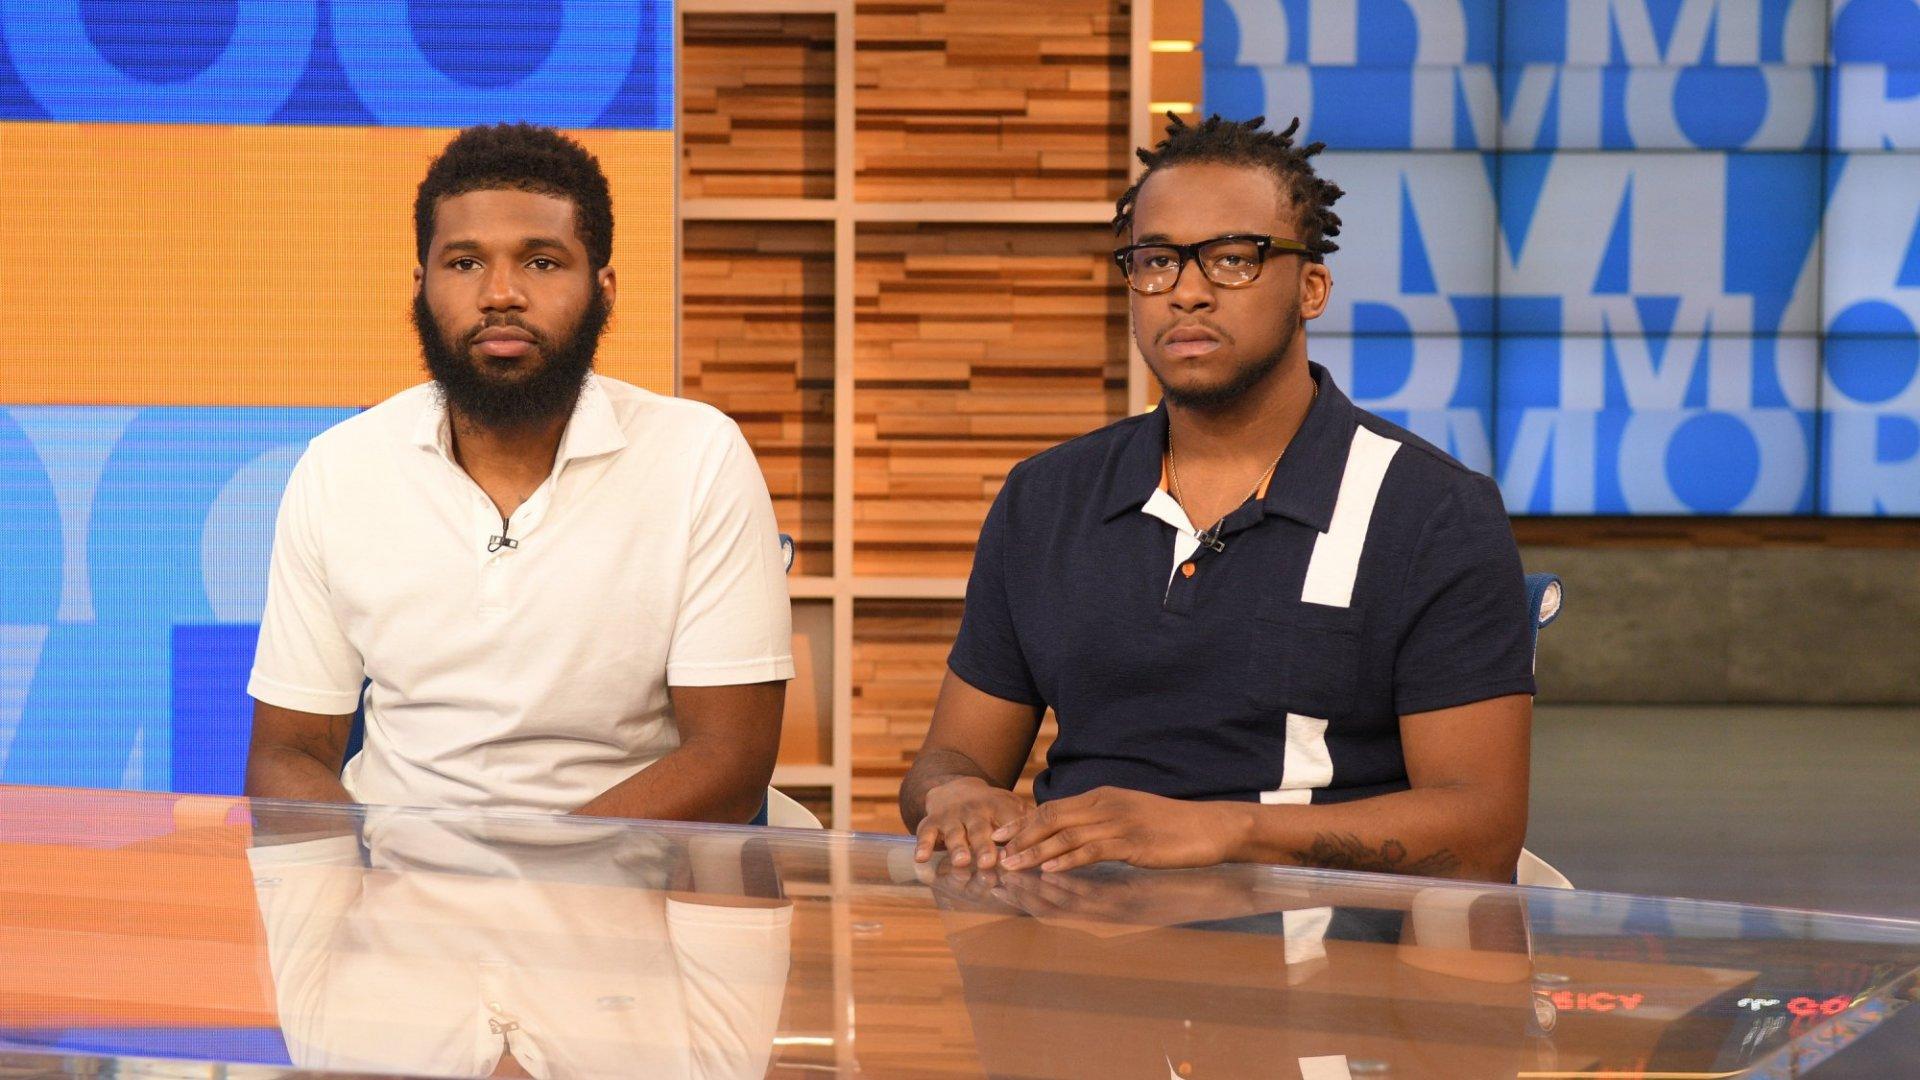 Rashon Nelson and Donte Robinson.